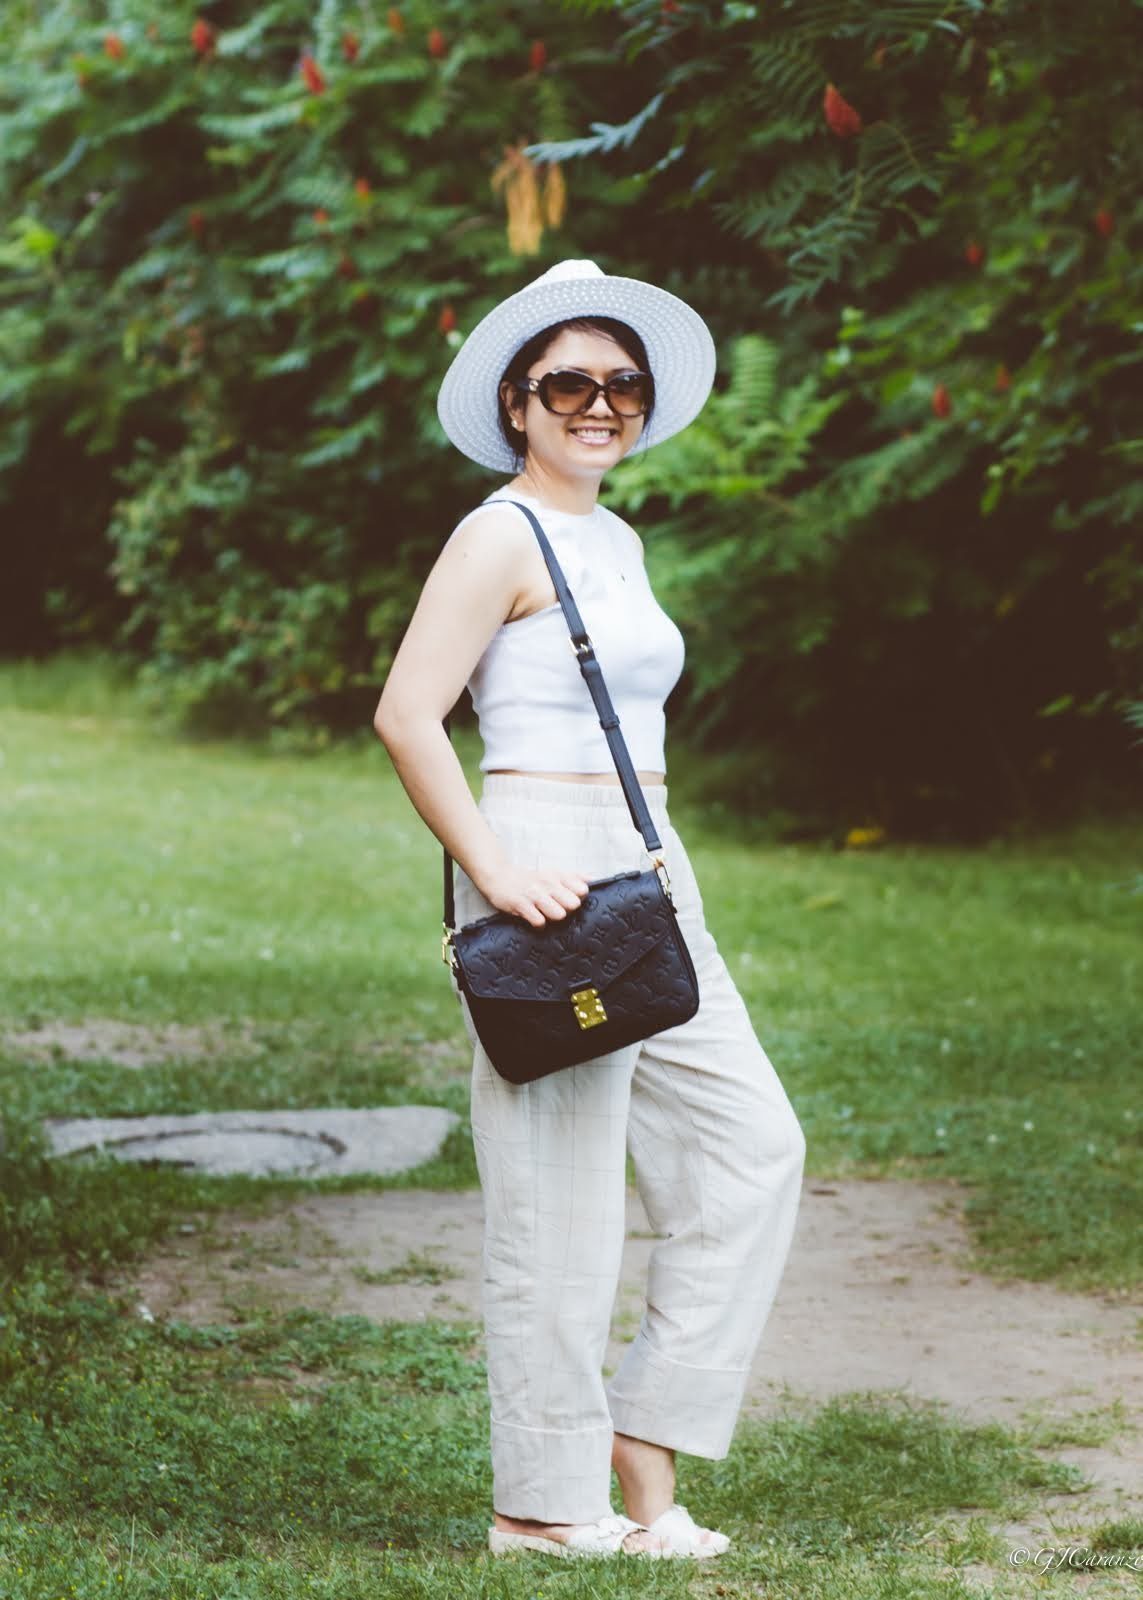 zara knit crop top_zara cuffed pants_louis vuitton pochette metis in black empreinte leather_coach bleeker sandals_gucci sunglasses_walmart sun hat